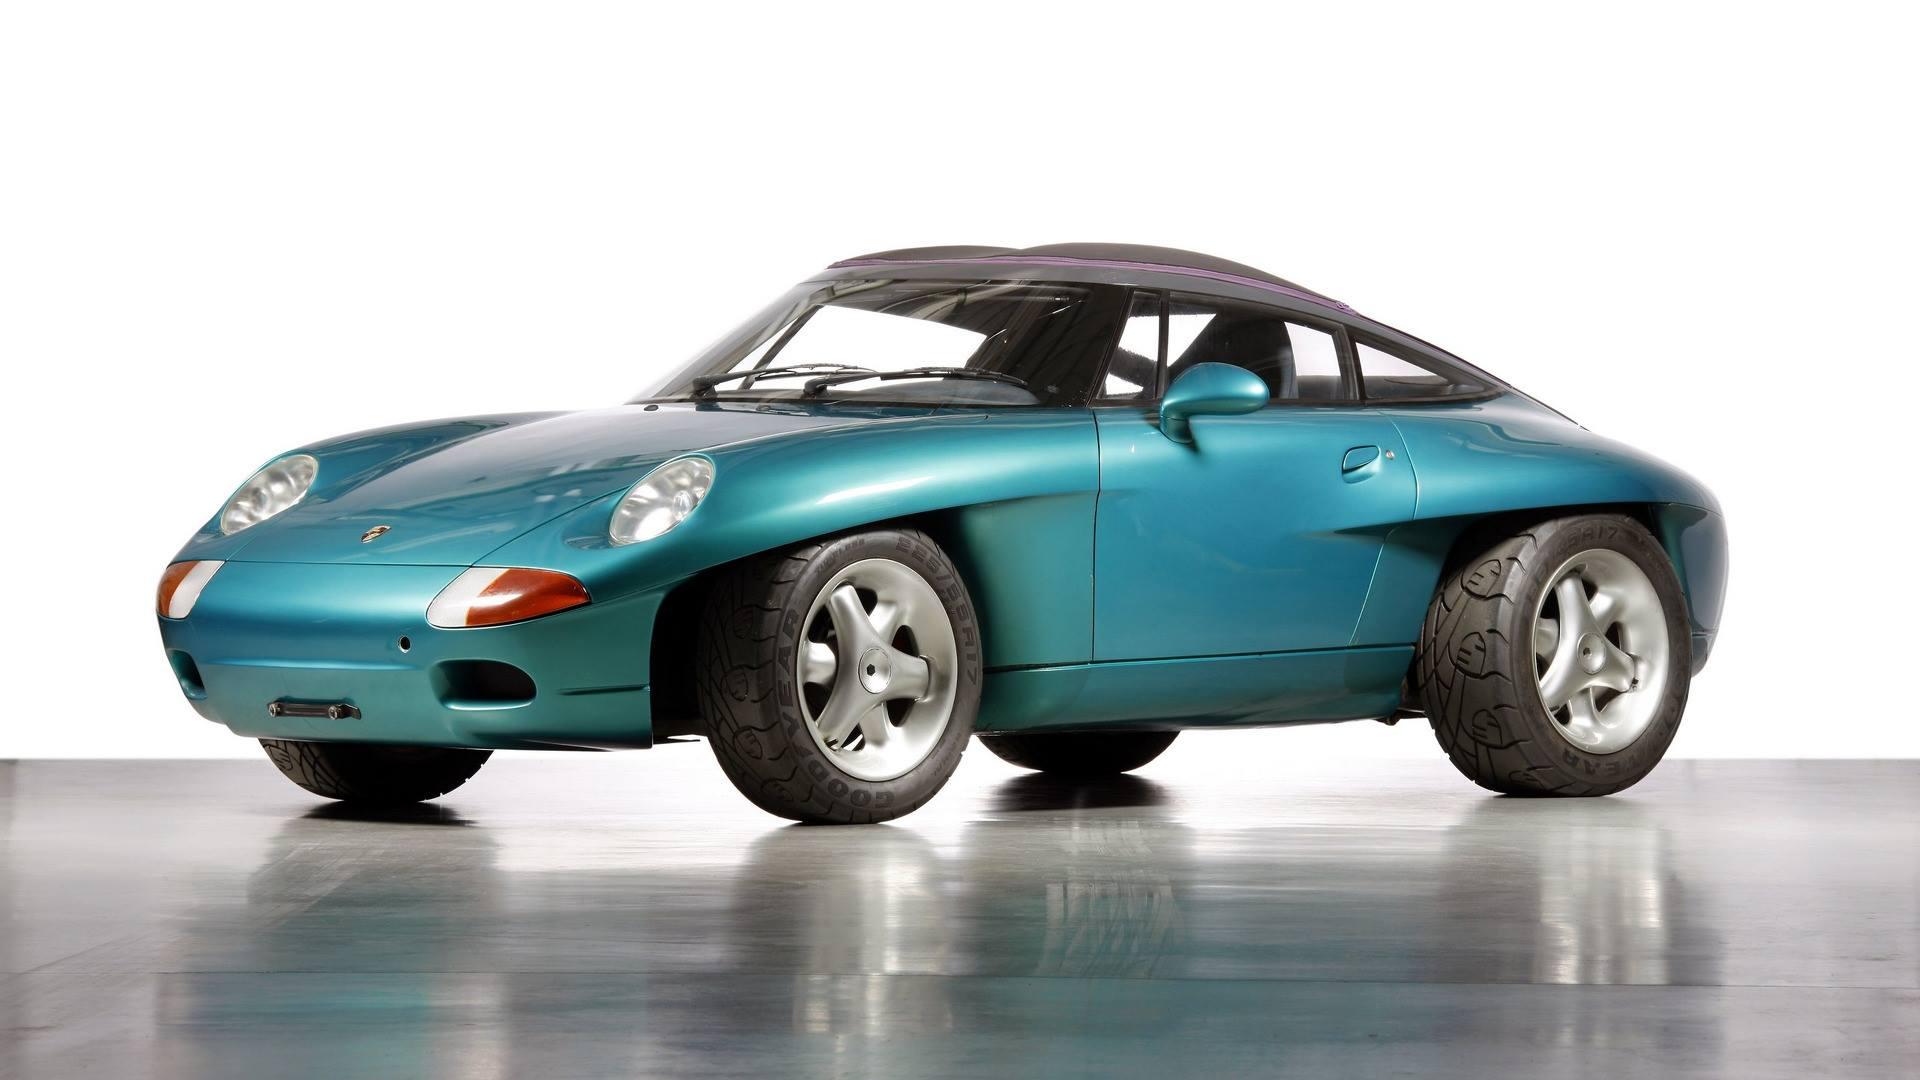 Porsche-Panamericana-Cabriolet-1989-3